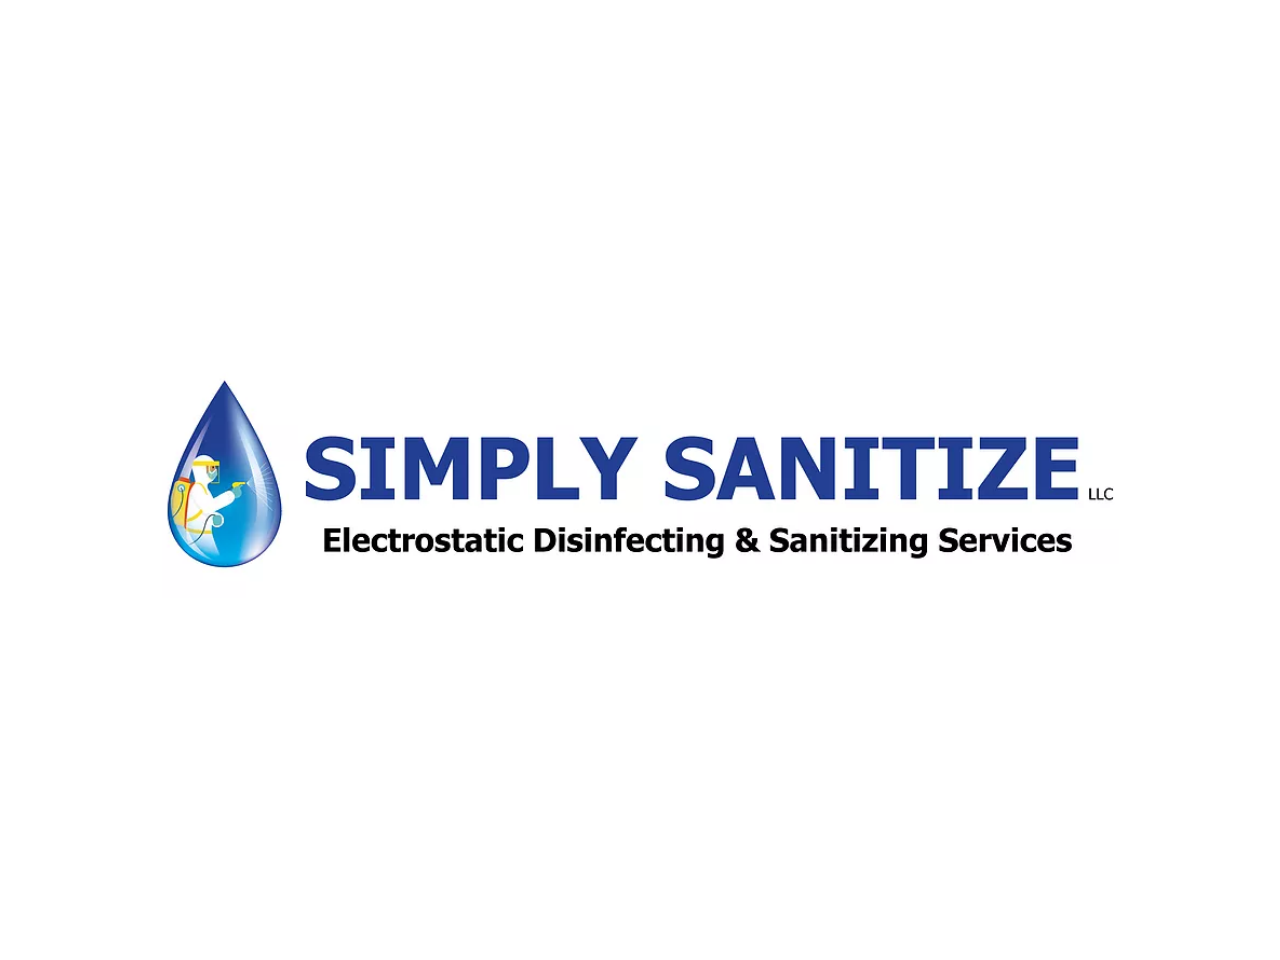 Simply Sanitize LLC